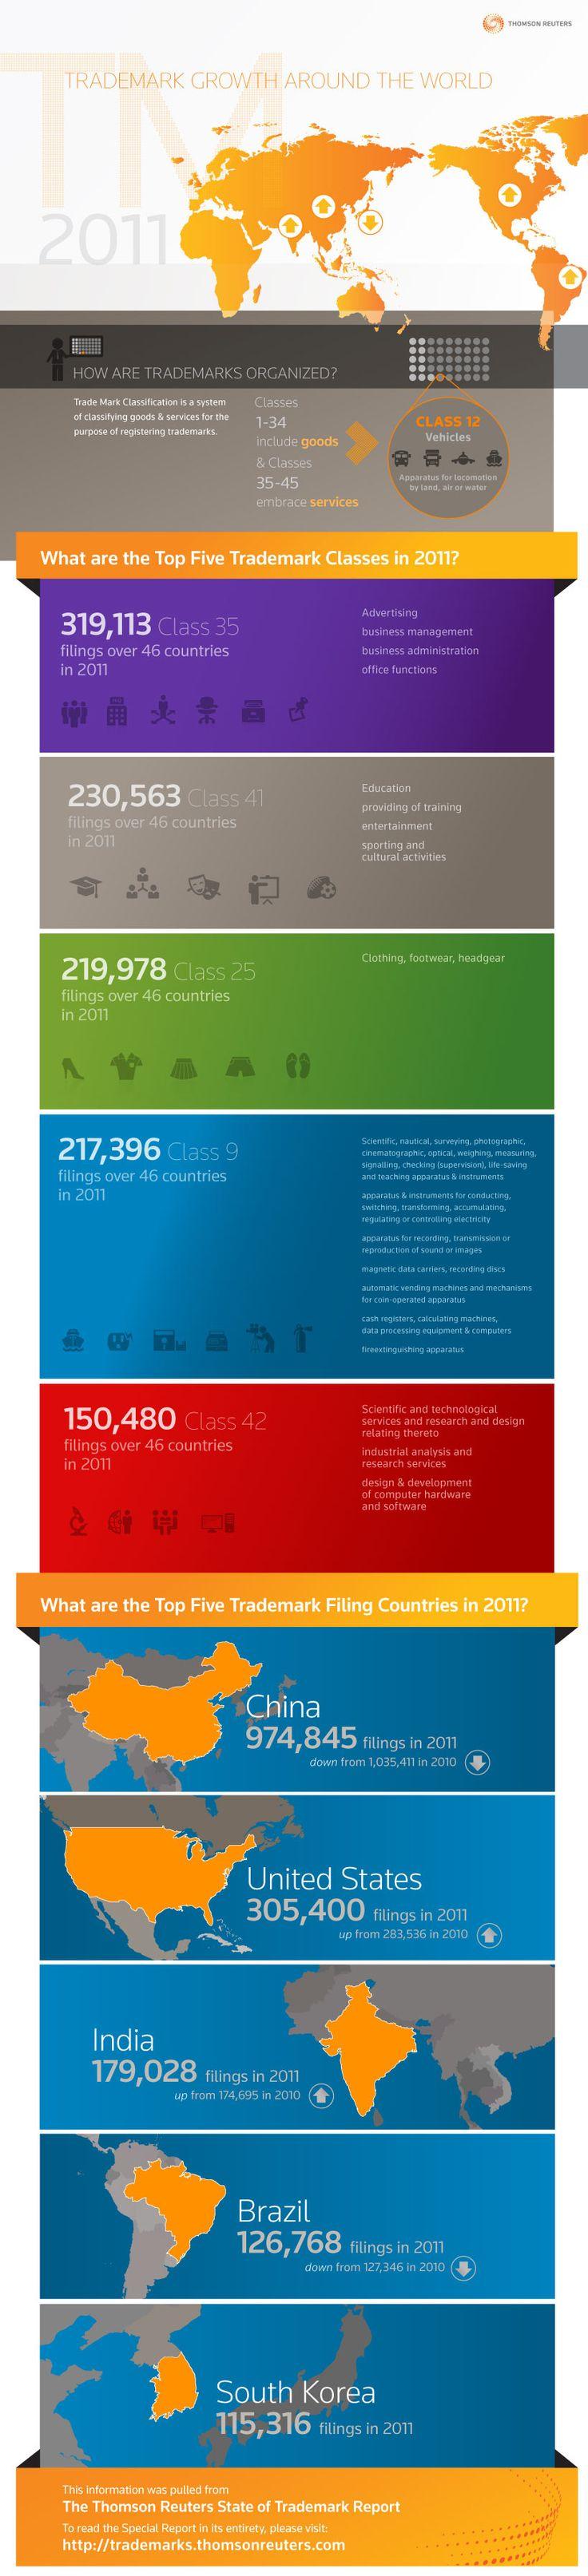 Trademark-Growth-Around-The-Web-infographic